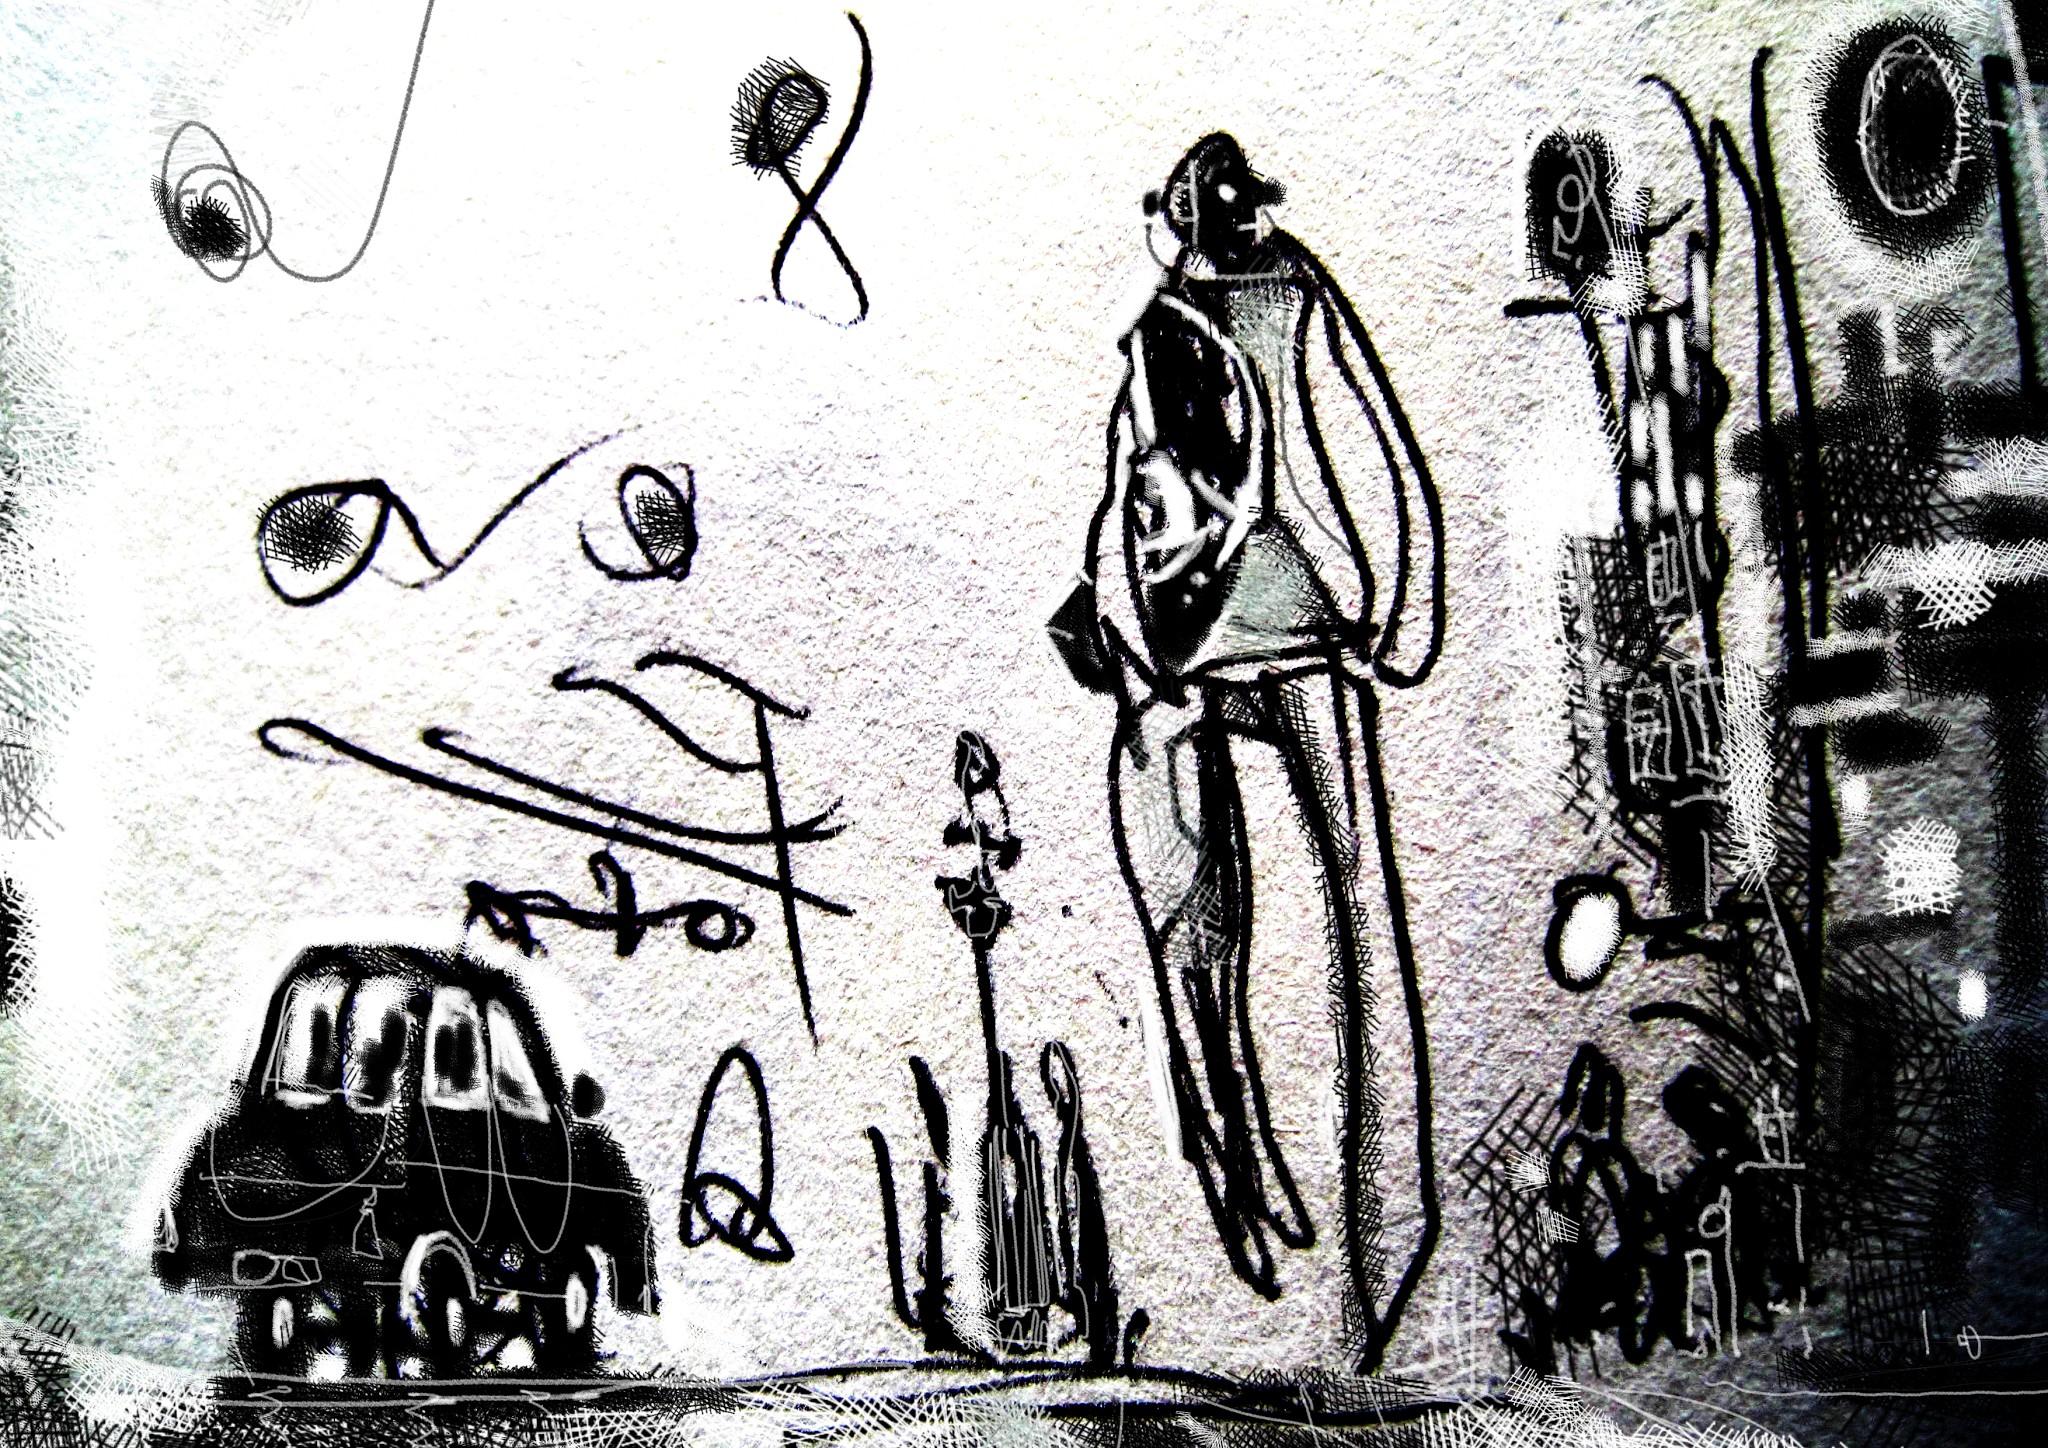 citywalk_0001 (1).jpg